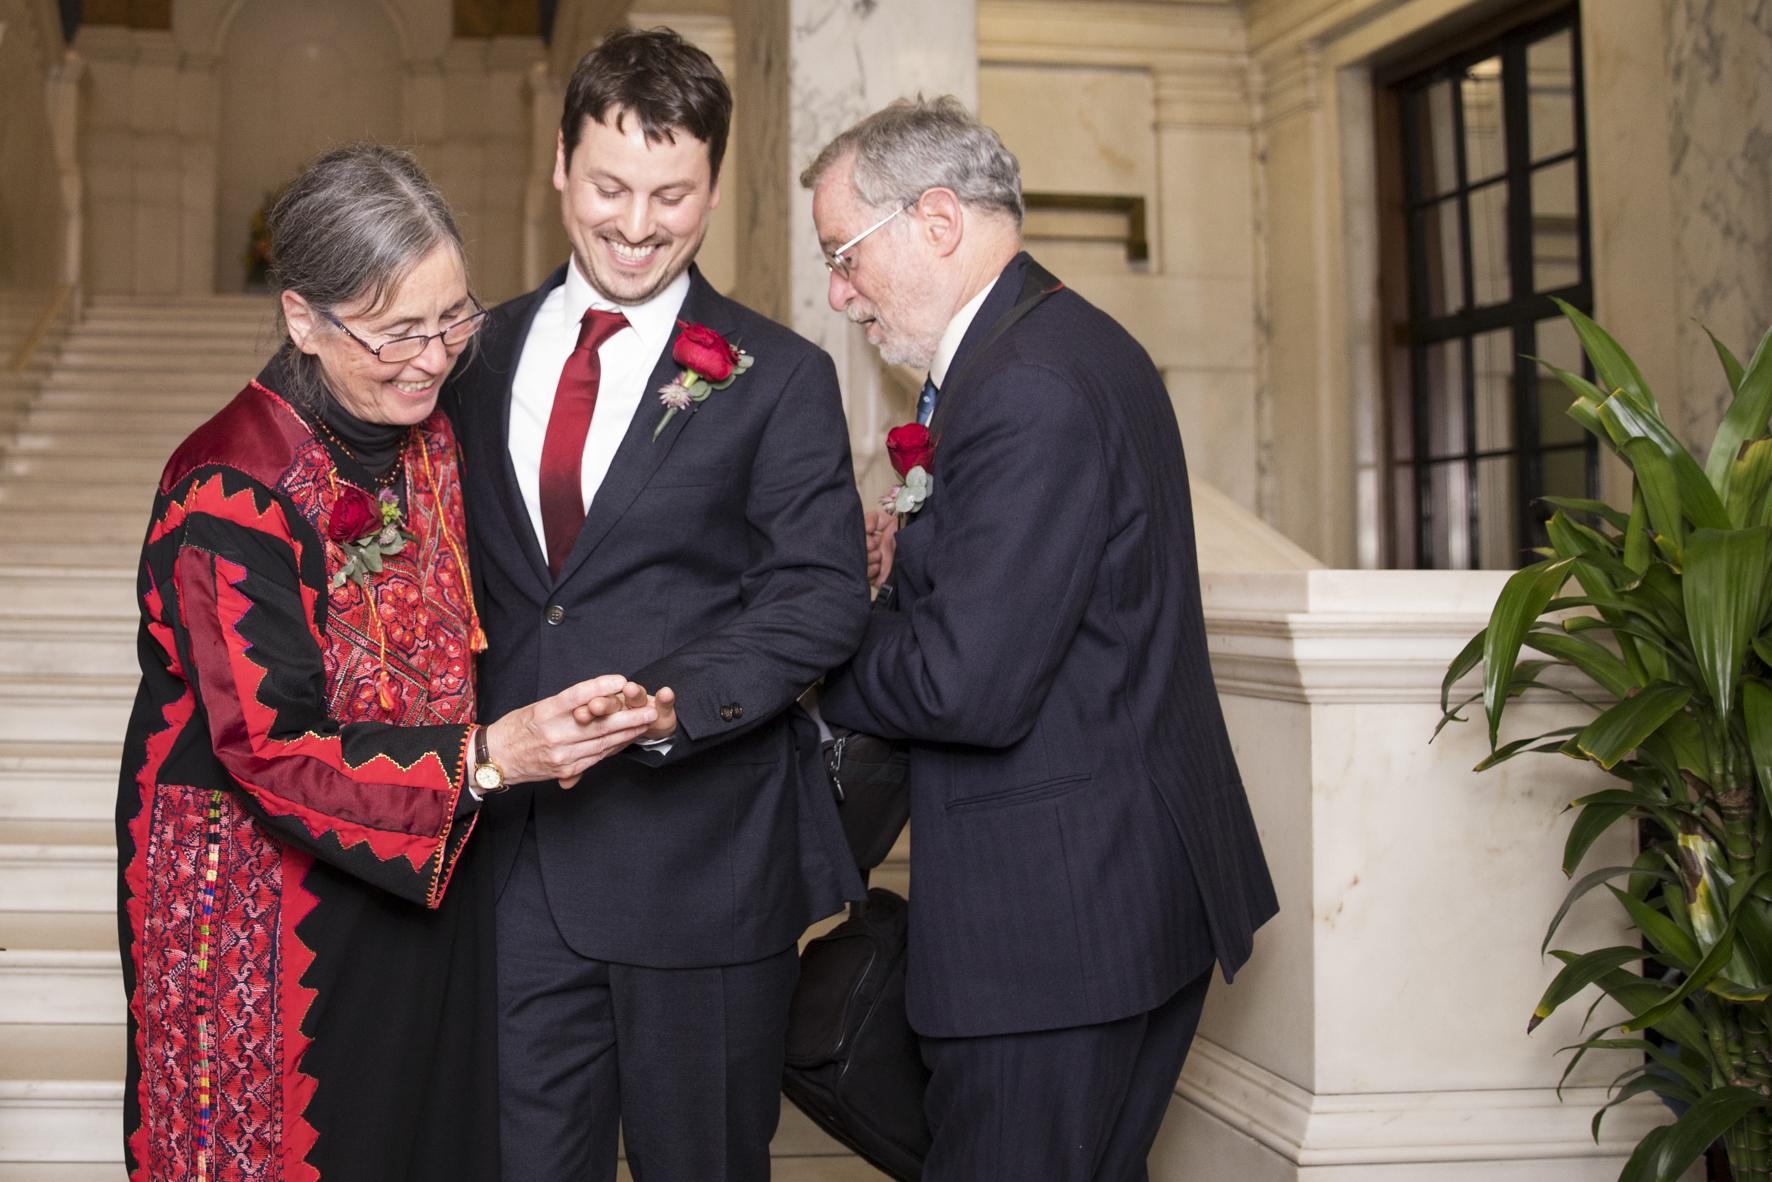 Wedding example_J&J_'16__69A1960_Claudia Leisinger.jpg